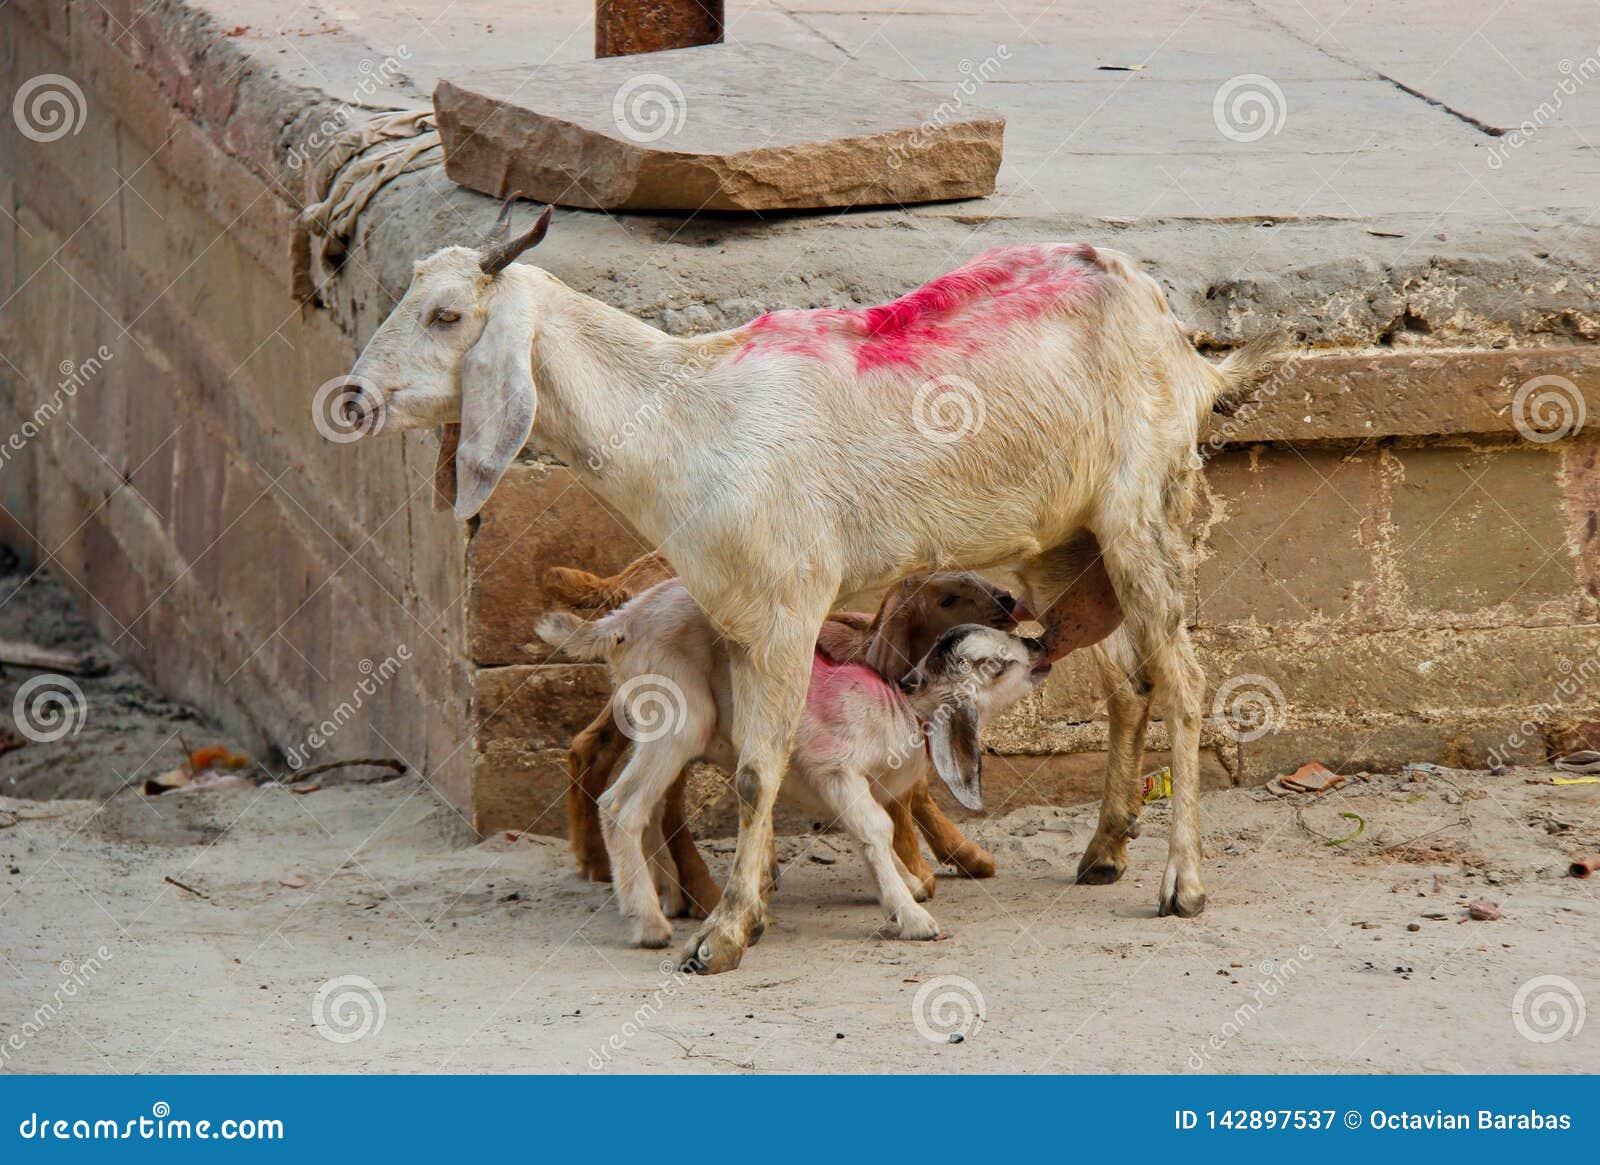 Goat kids enjoying fresh milk near Ganges river in India